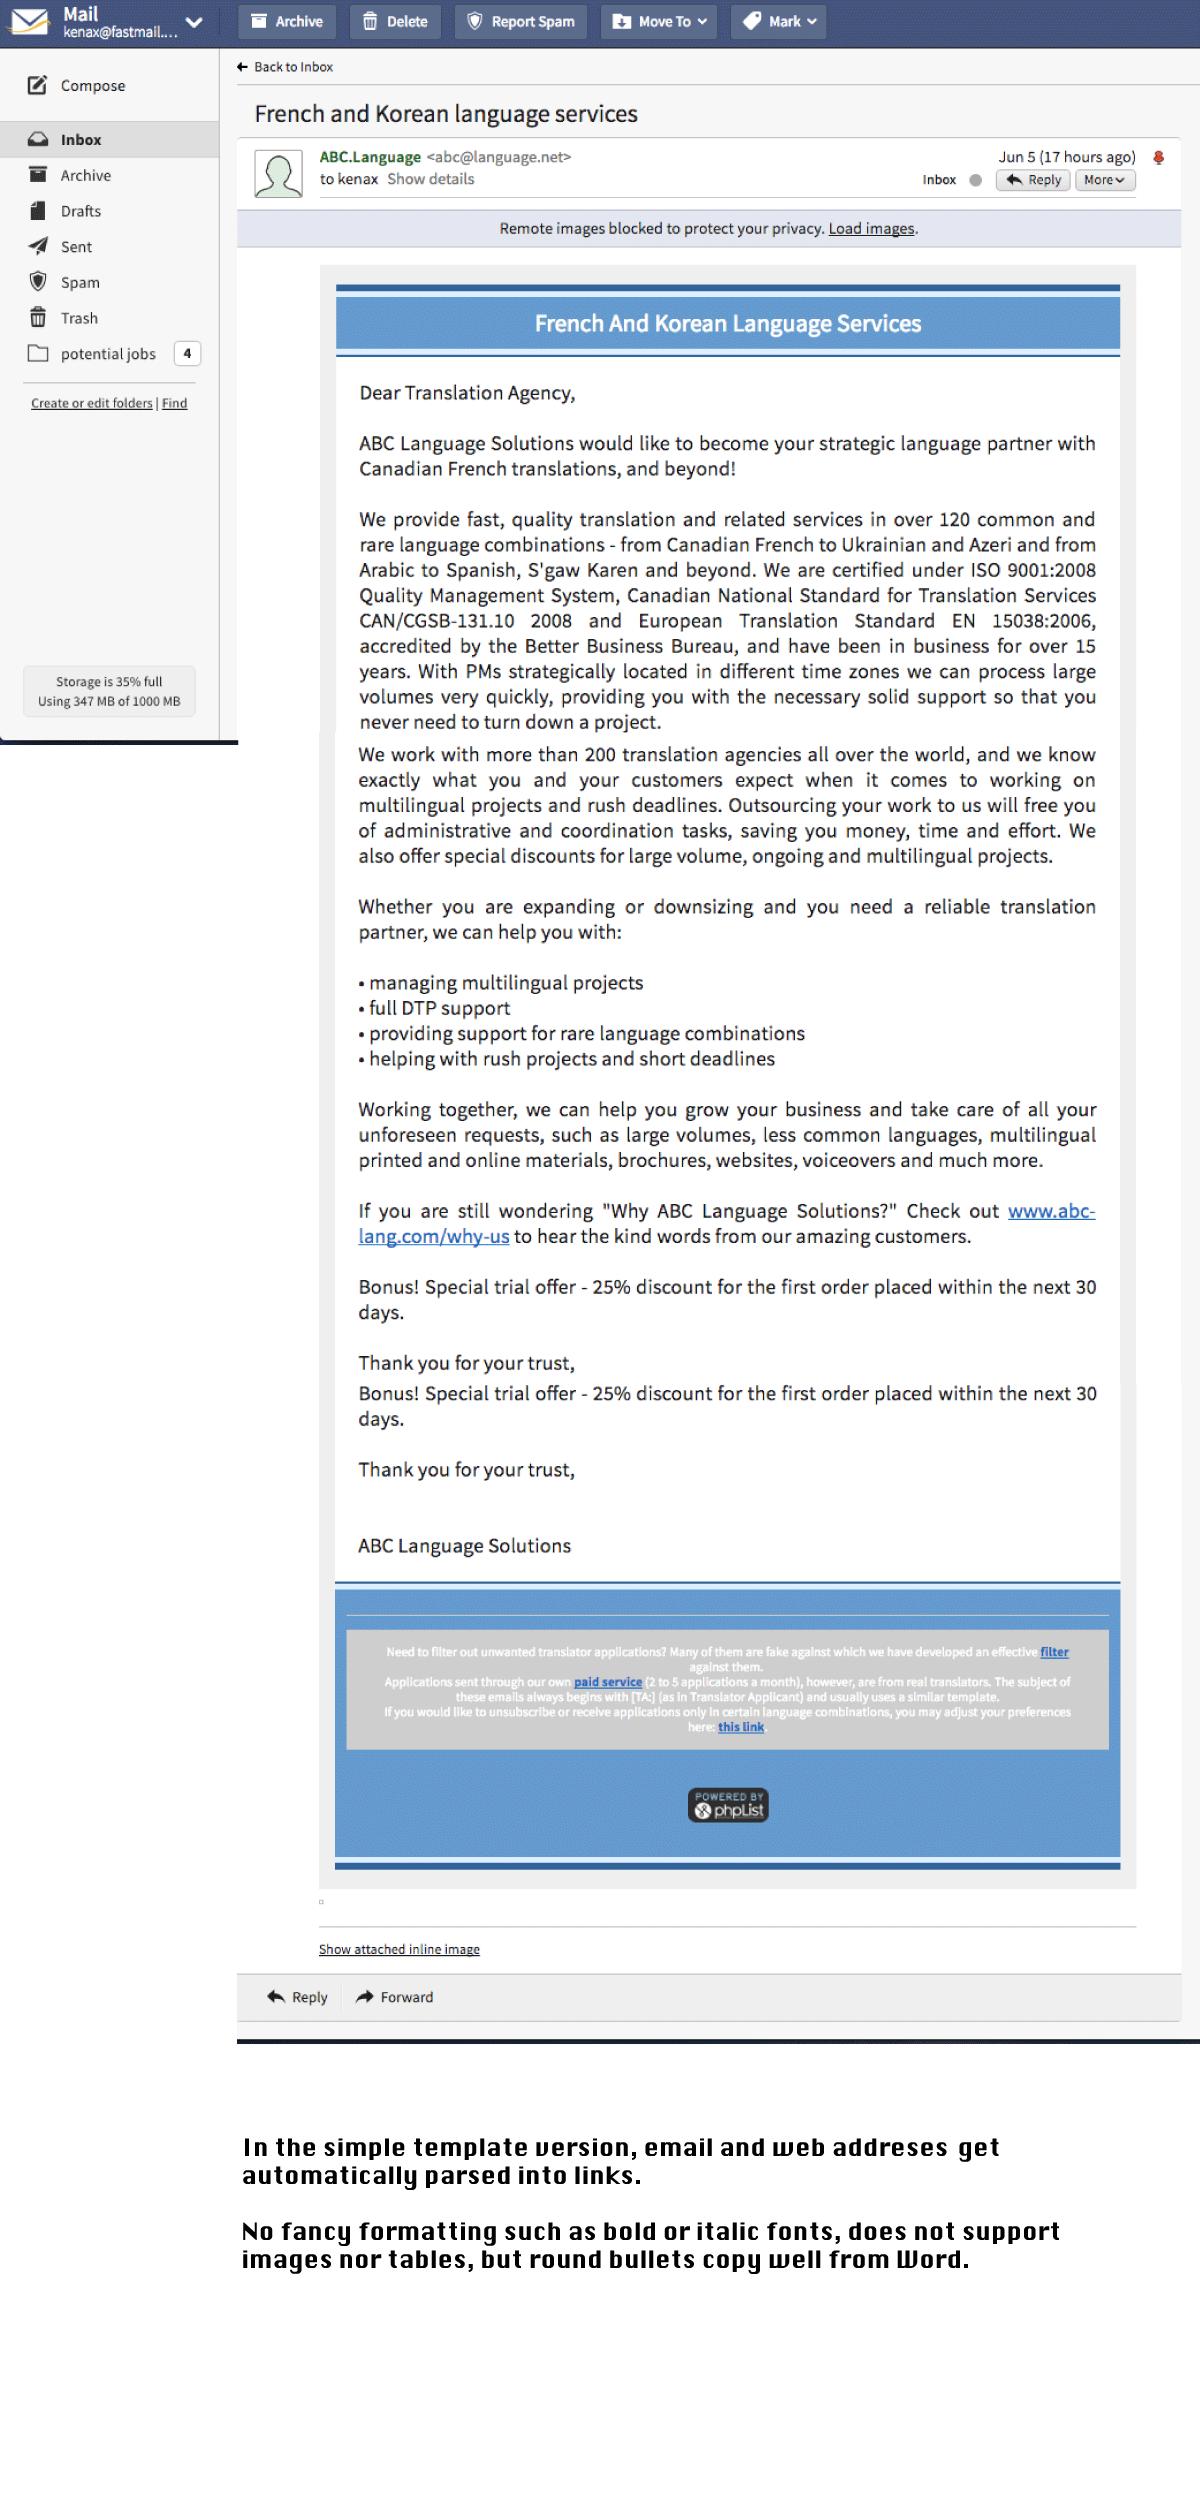 translation-work-jobs-email-sample-simple-template